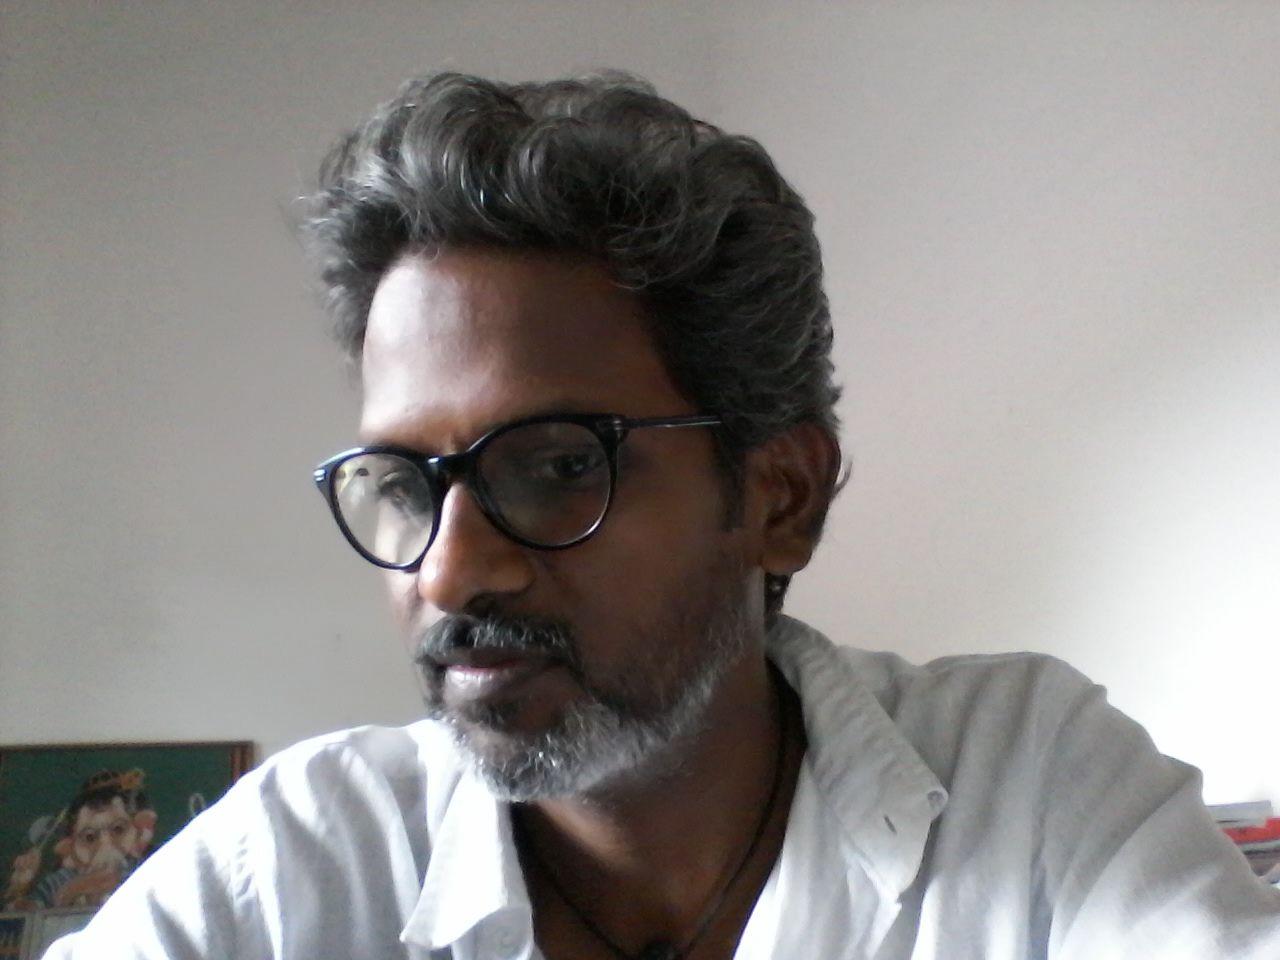 Archt. Asokan Sritharan